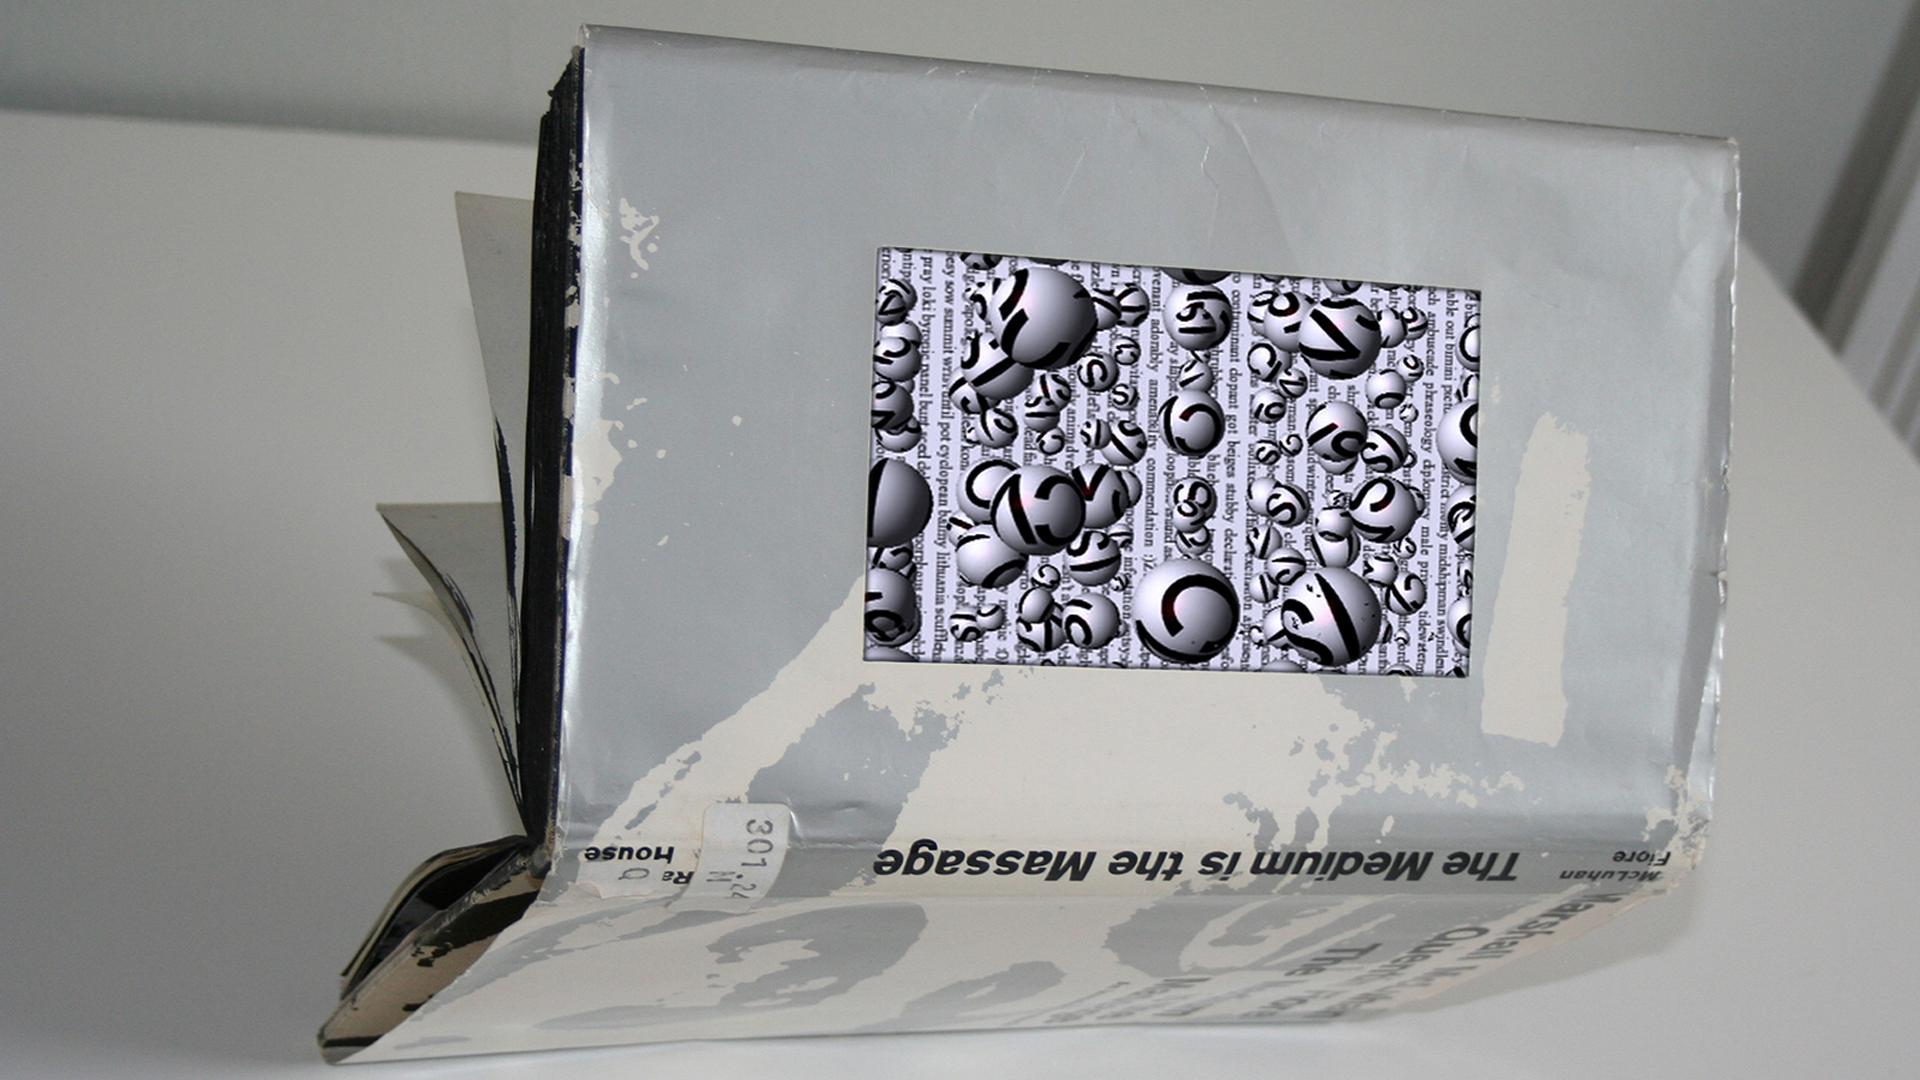 ©2010, Joseph Farbrook, Boolean Image Video Sculpture